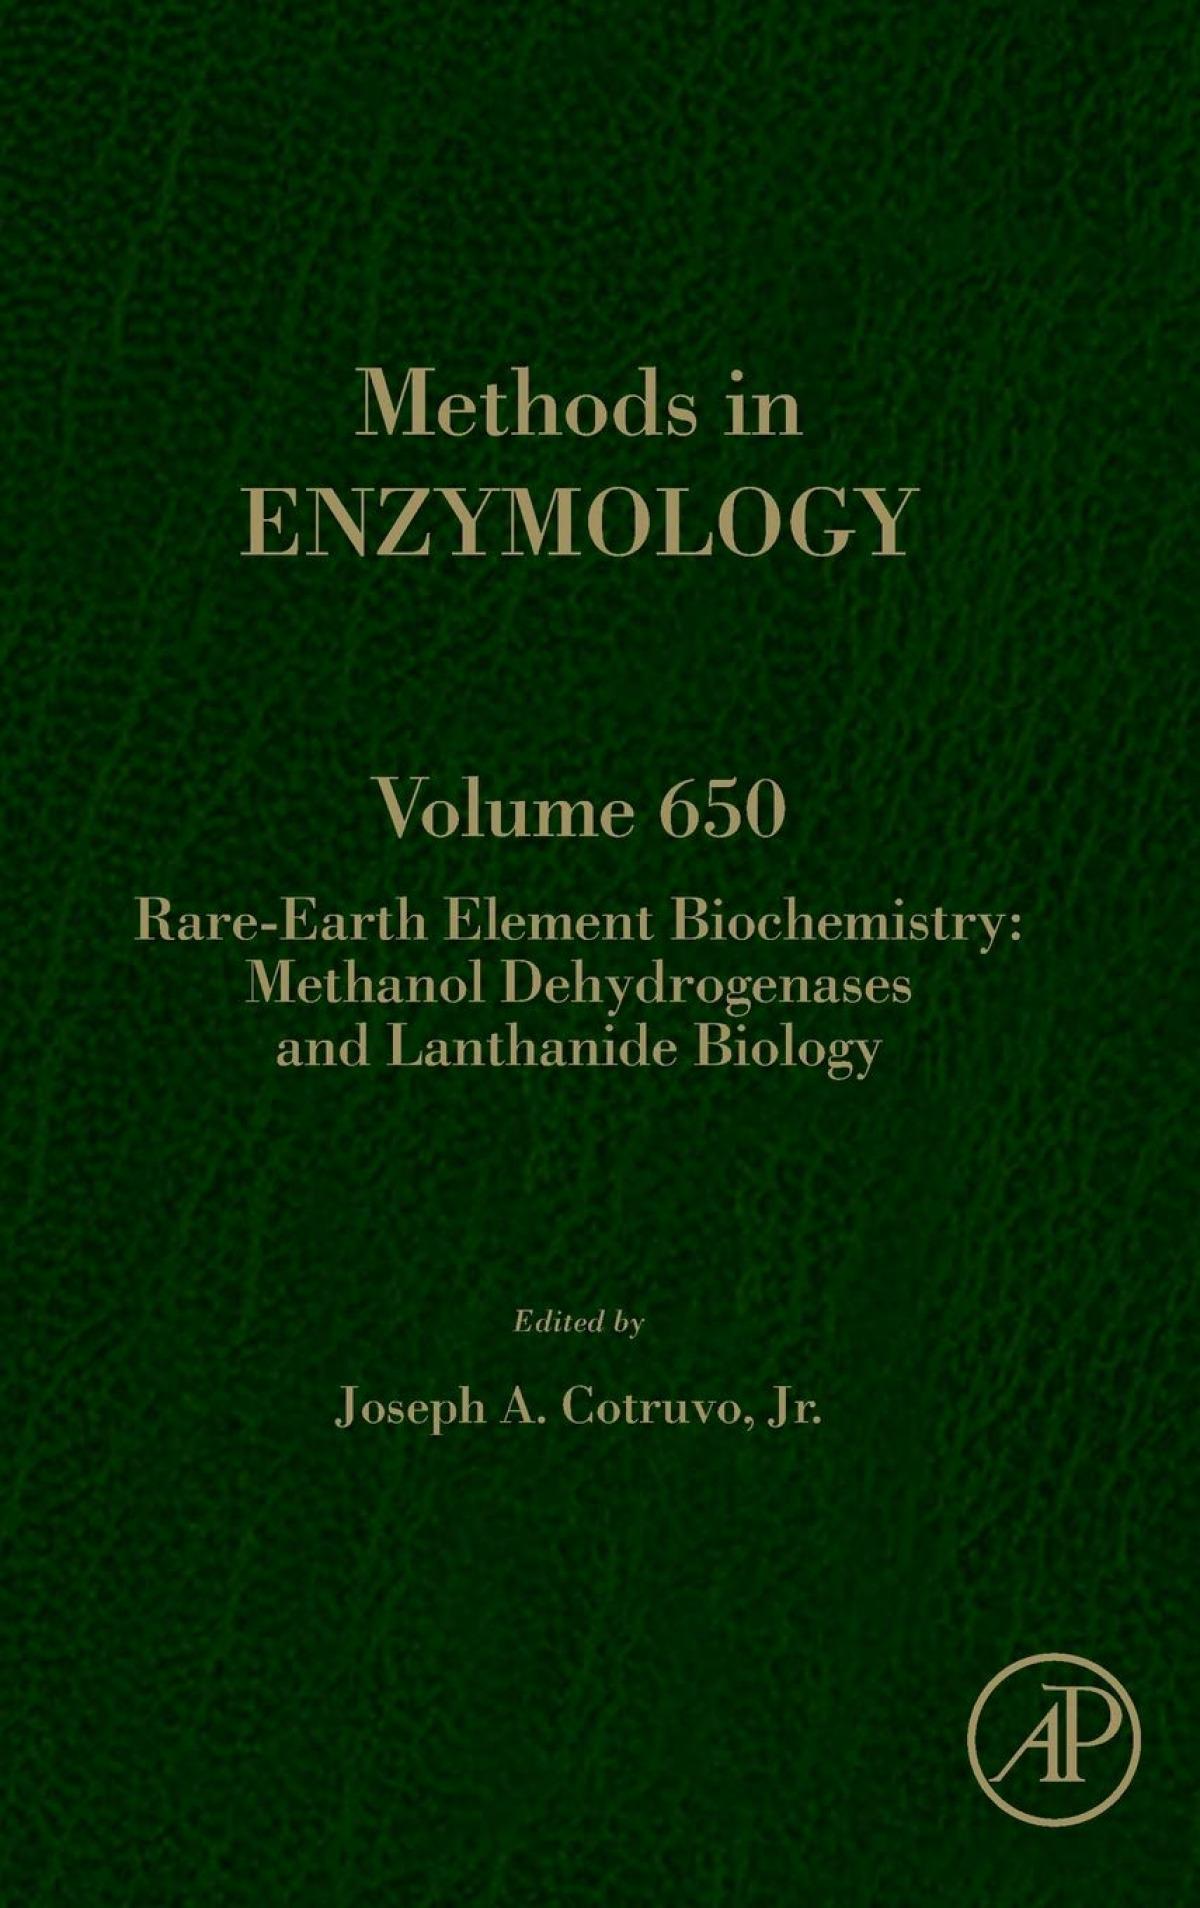 RARE-EARTH ELEMENT BIOCHEMISTRY:METHANOL DEHYDROGENASES 650